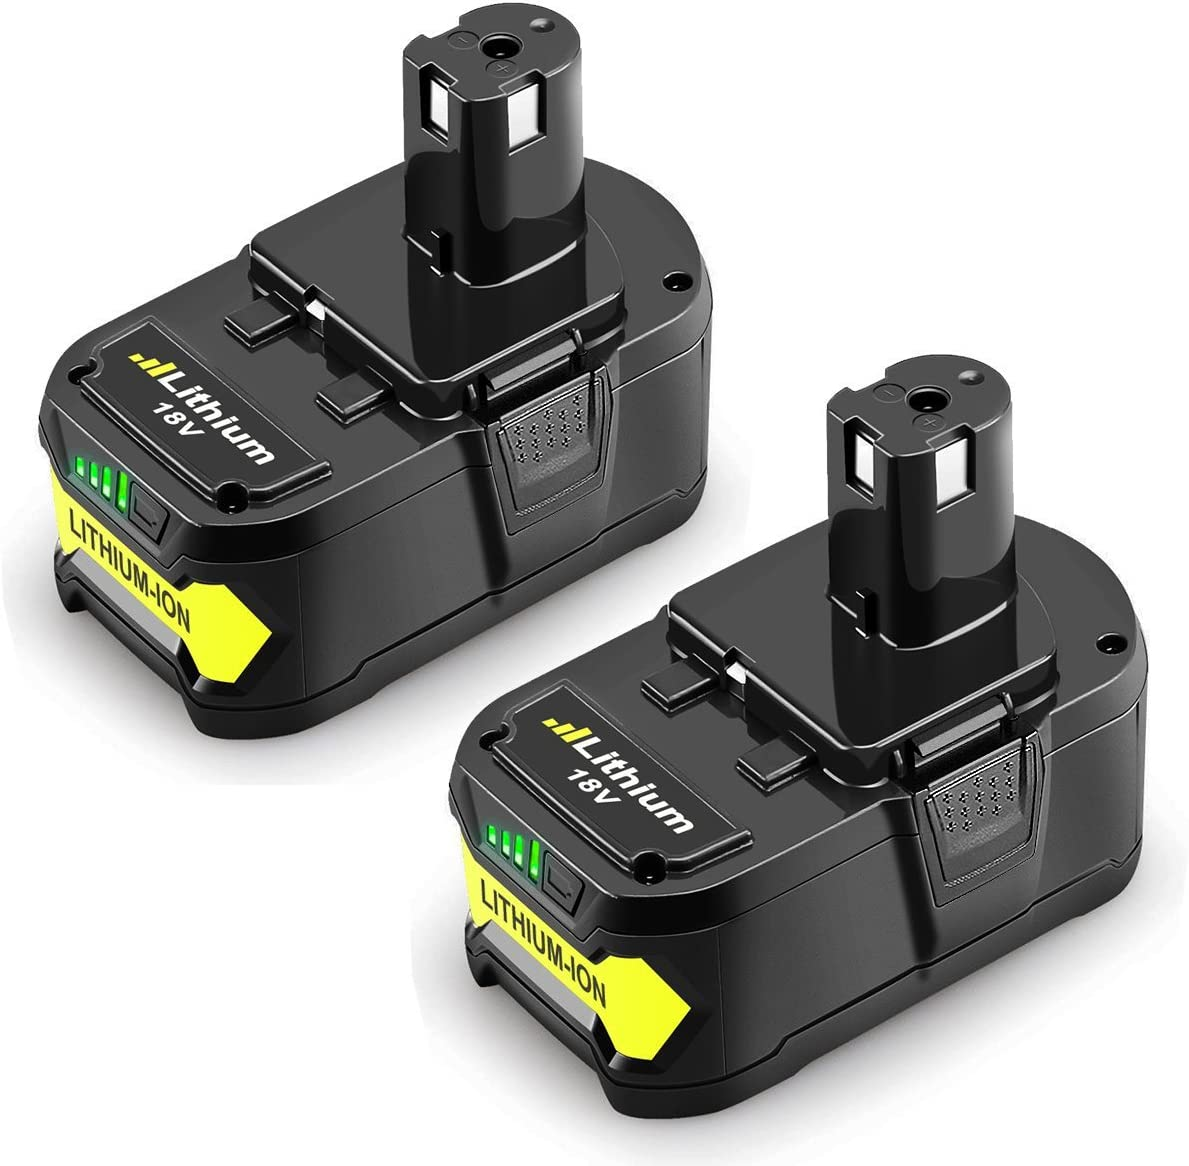 Powtree Li-ion 3000mAh P108 Ryobi 18V Li-ion Replacement Battery Compatible with Ryobi P102 P103 P105 P107 P108 P109 Cordless Tool Battery